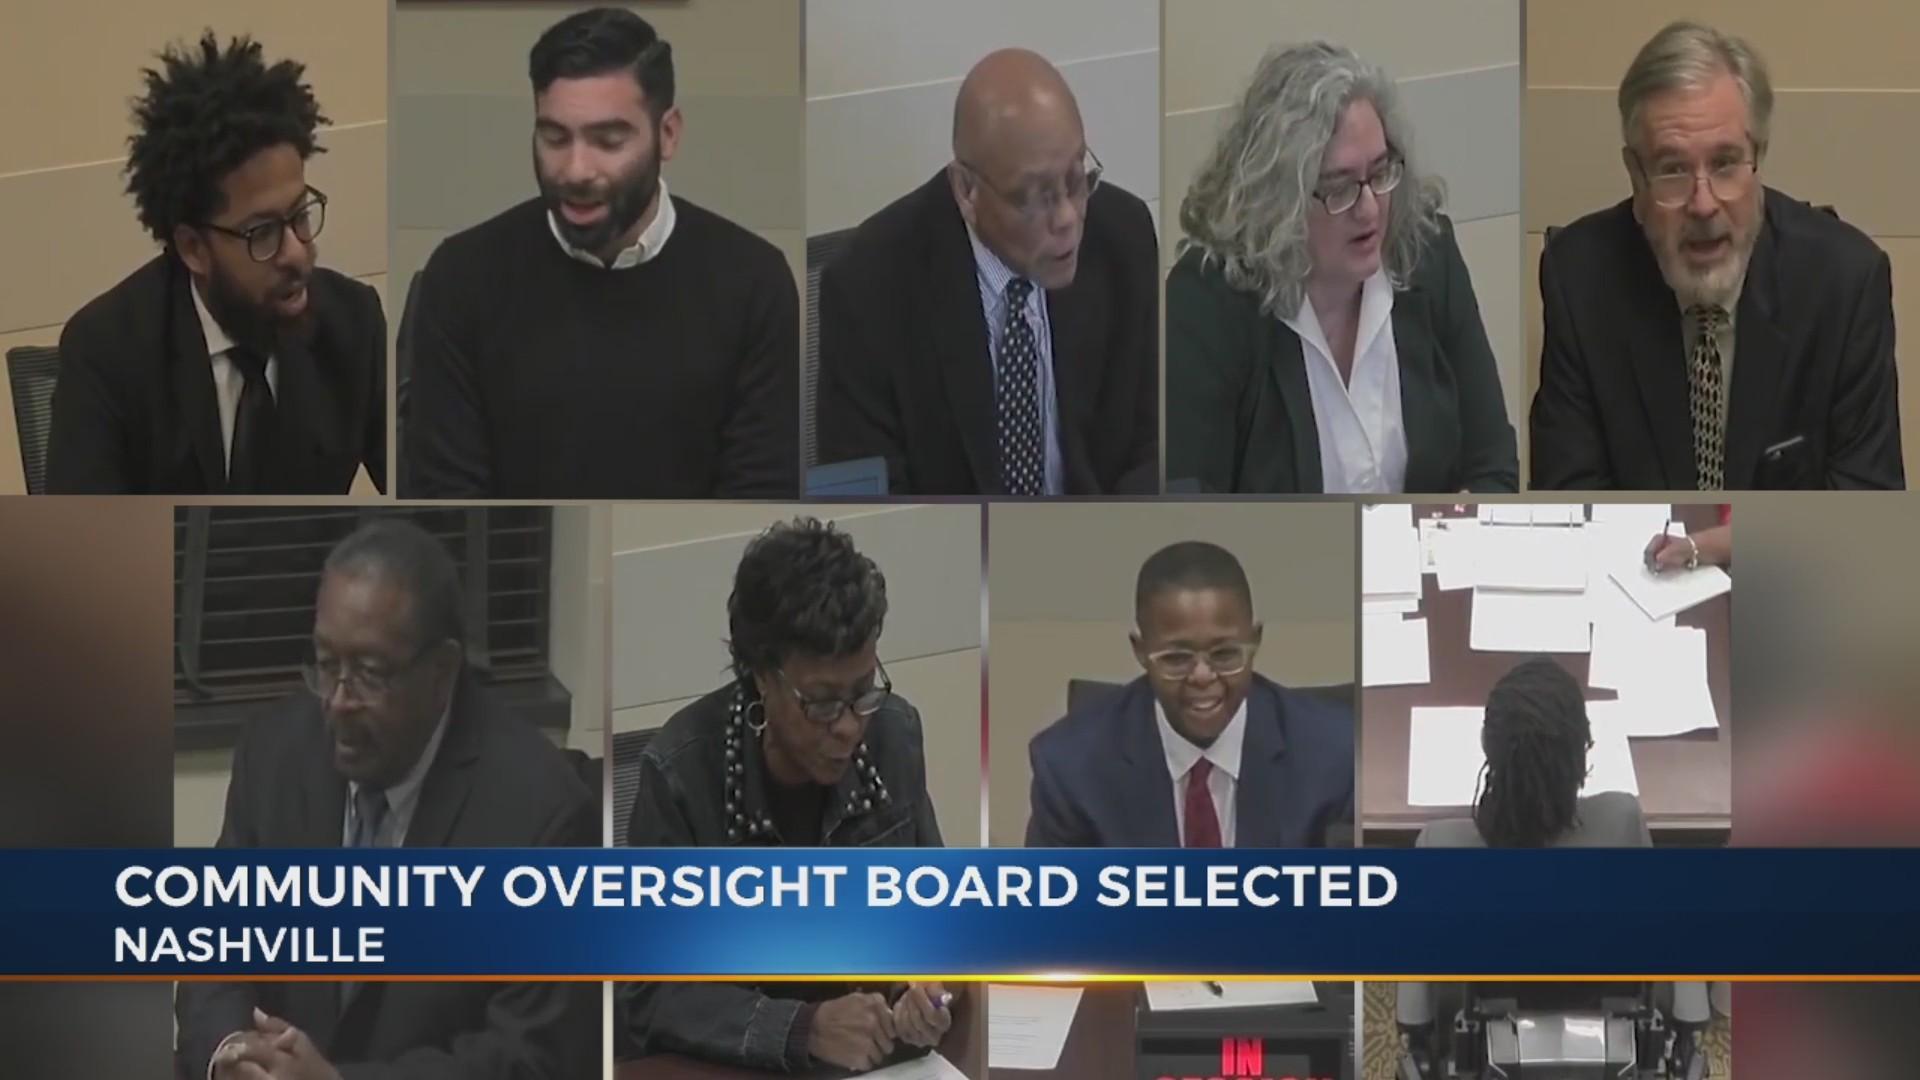 Community_oversight_board_0_20190123222927